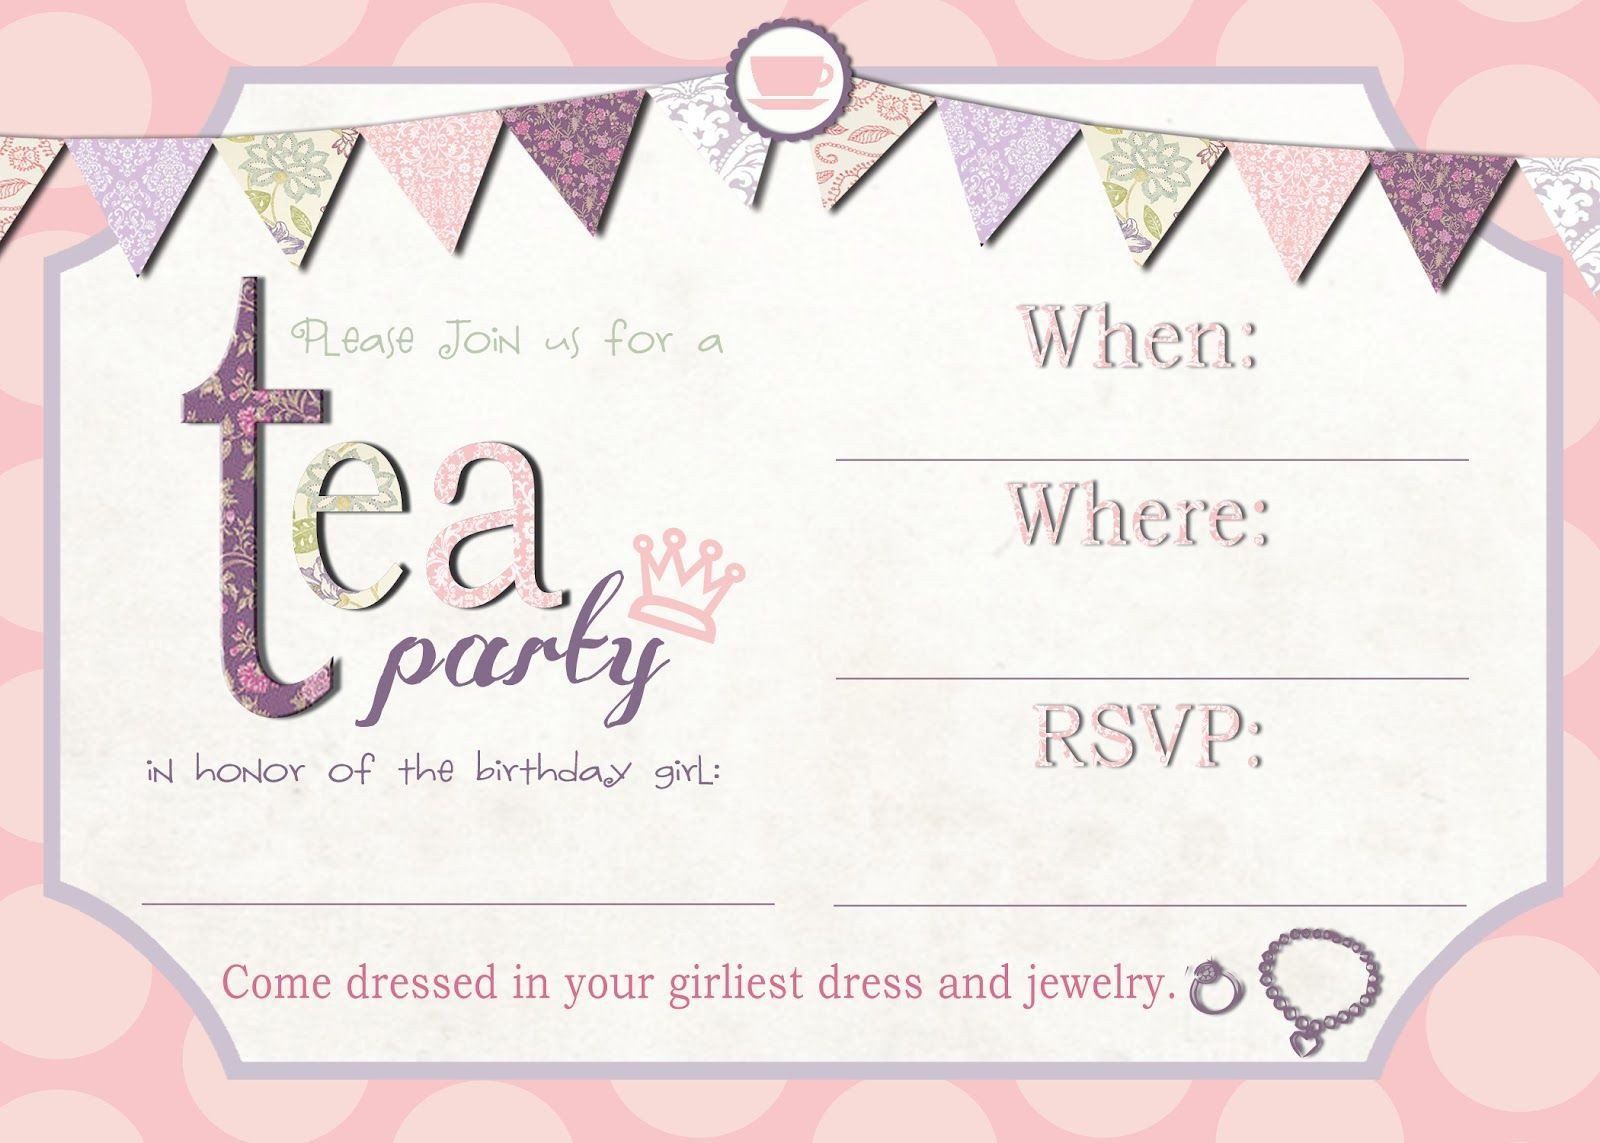 Tea Party Invitations Templates Tea Party Invitation Template Download – Invitetown